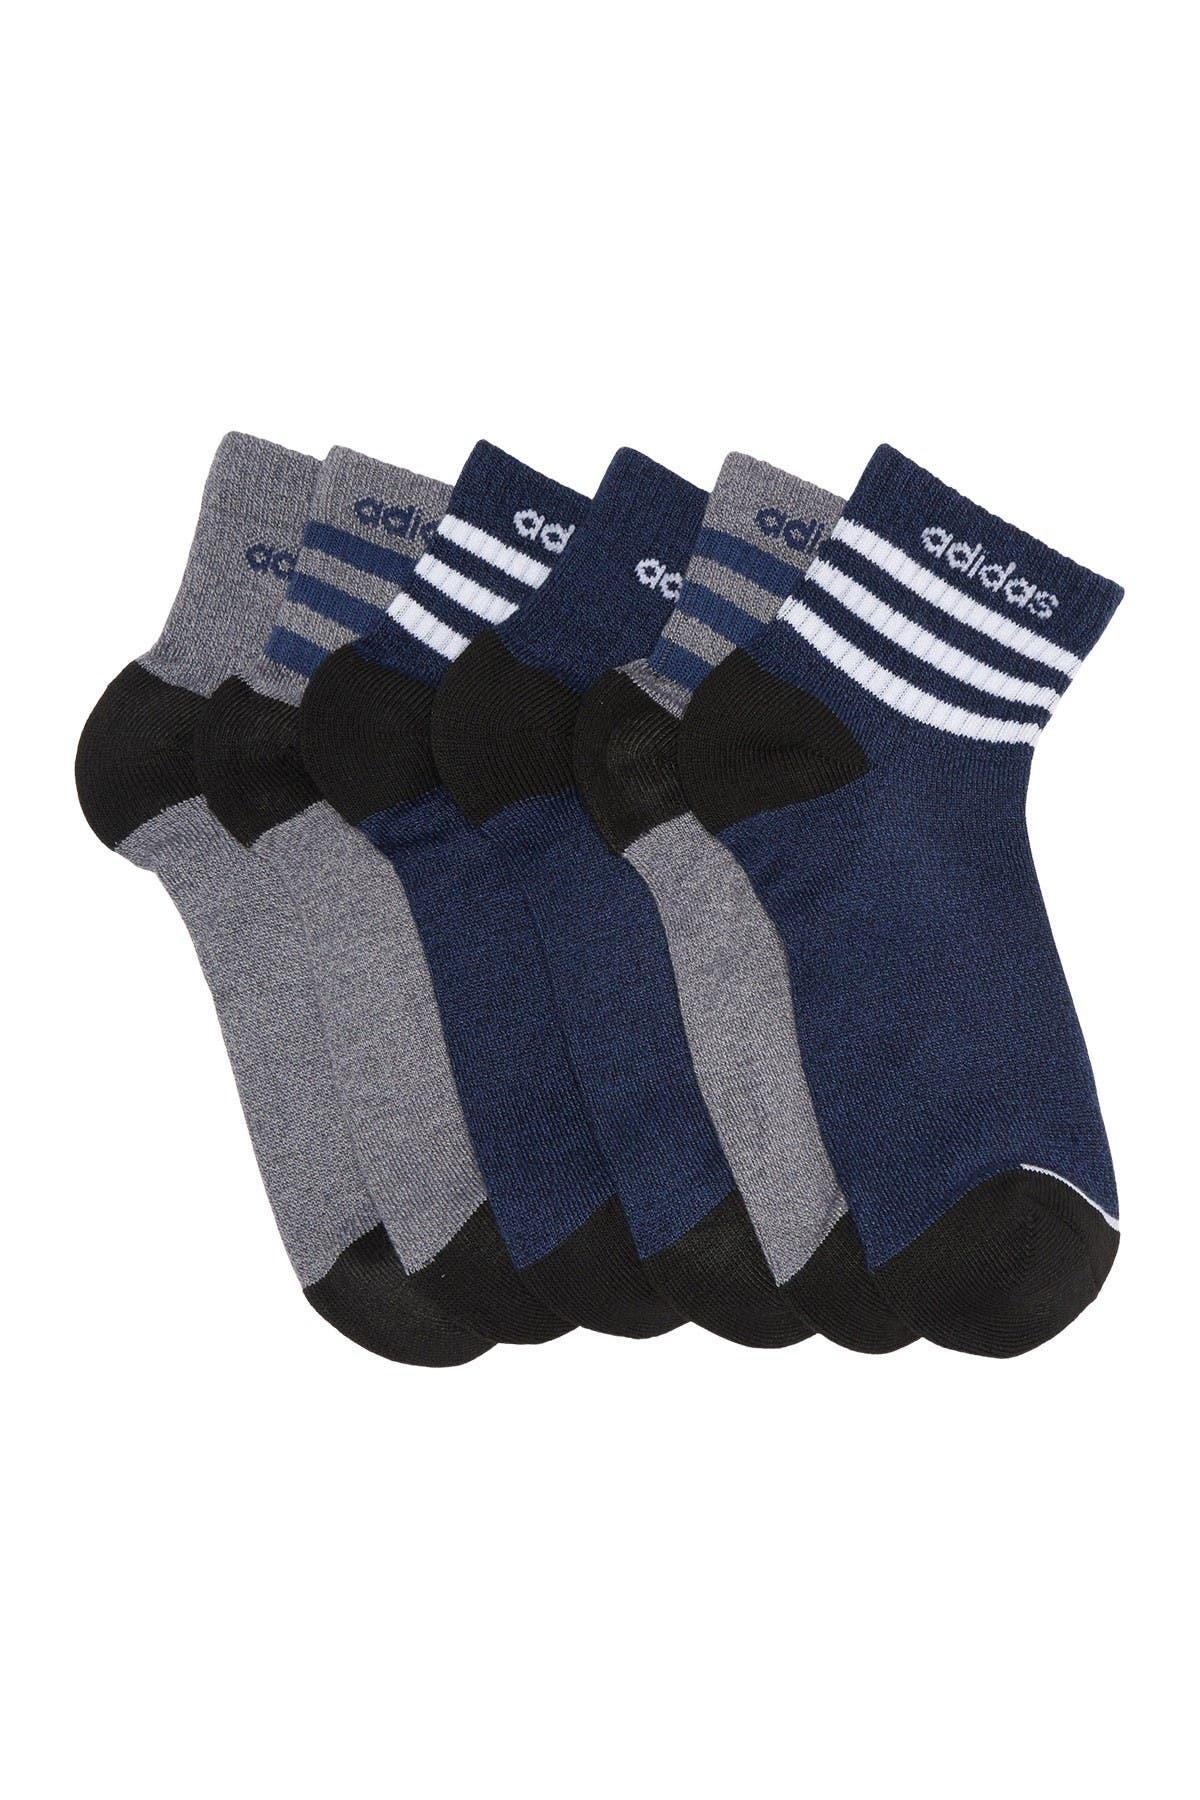 Image of adidas 3-Stripes Quarter Crew Socks - Pack of 6